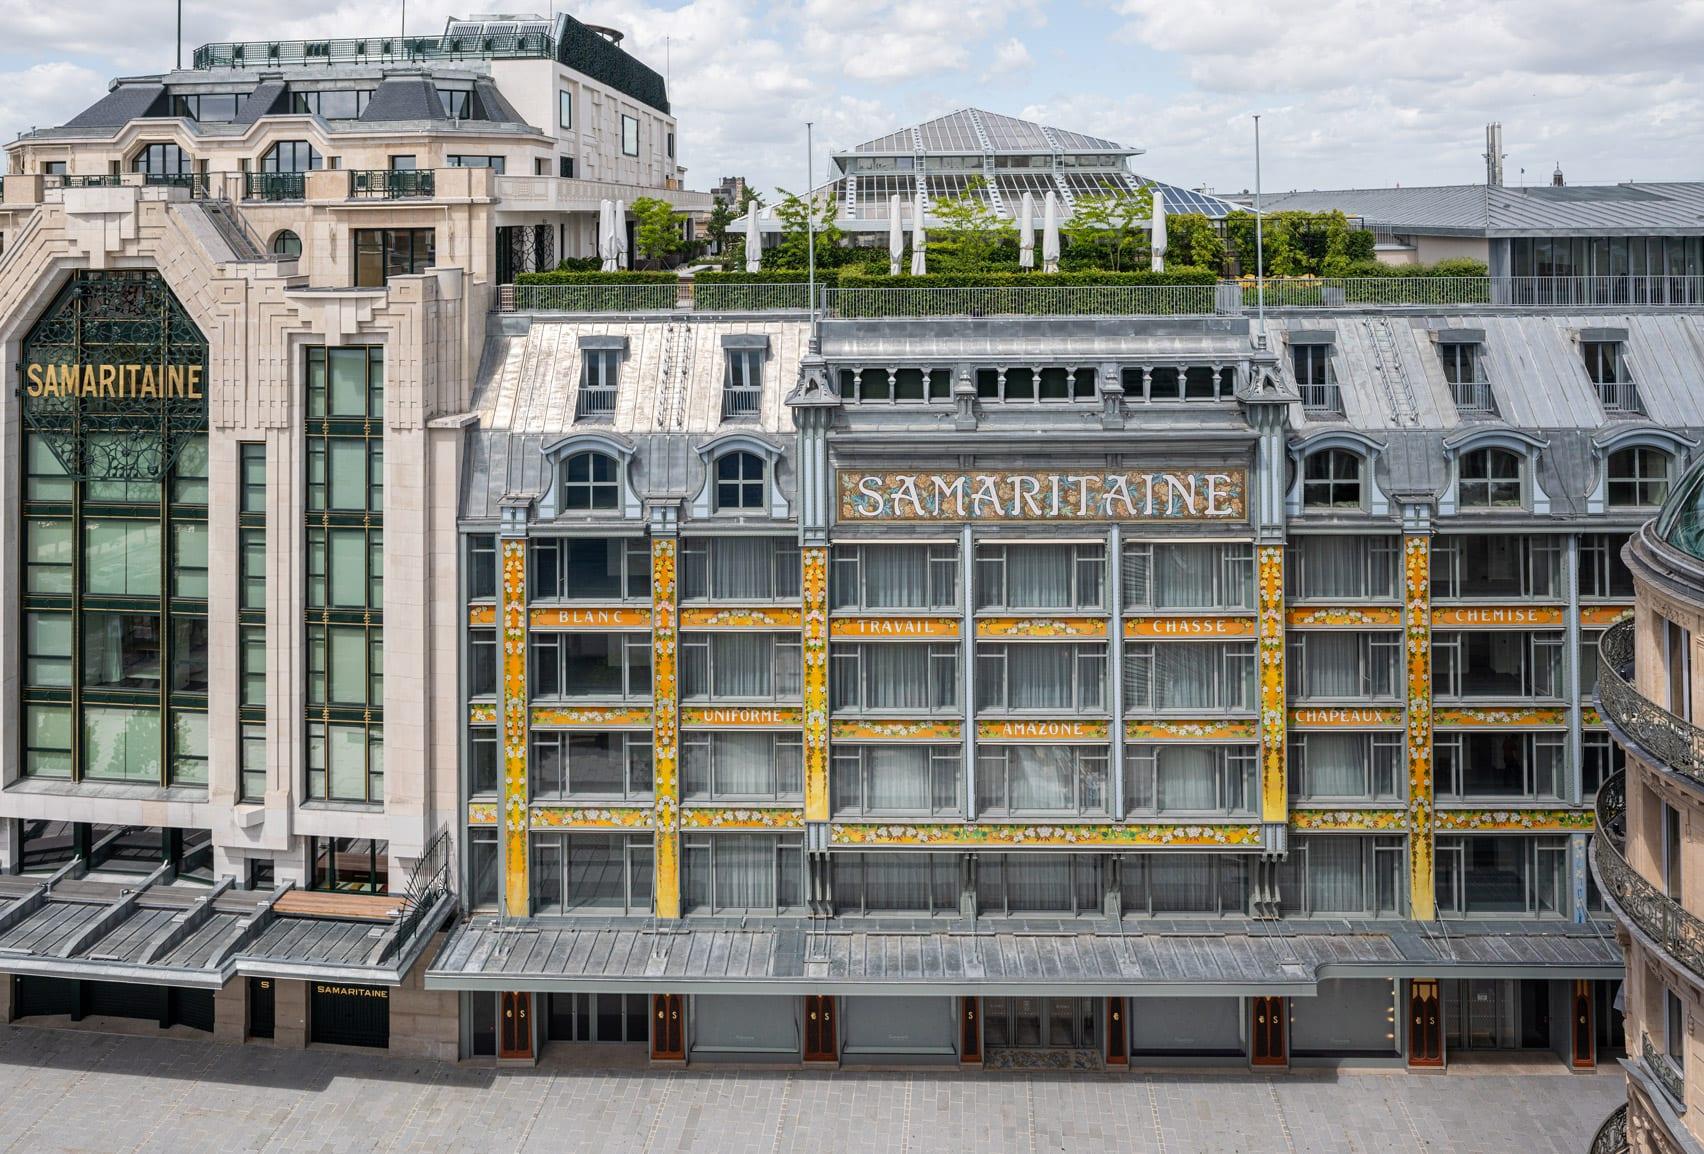 la-samaritaine-sanaa-architecture-renovations-paris-france_dezeen_1704_col_6.jpg